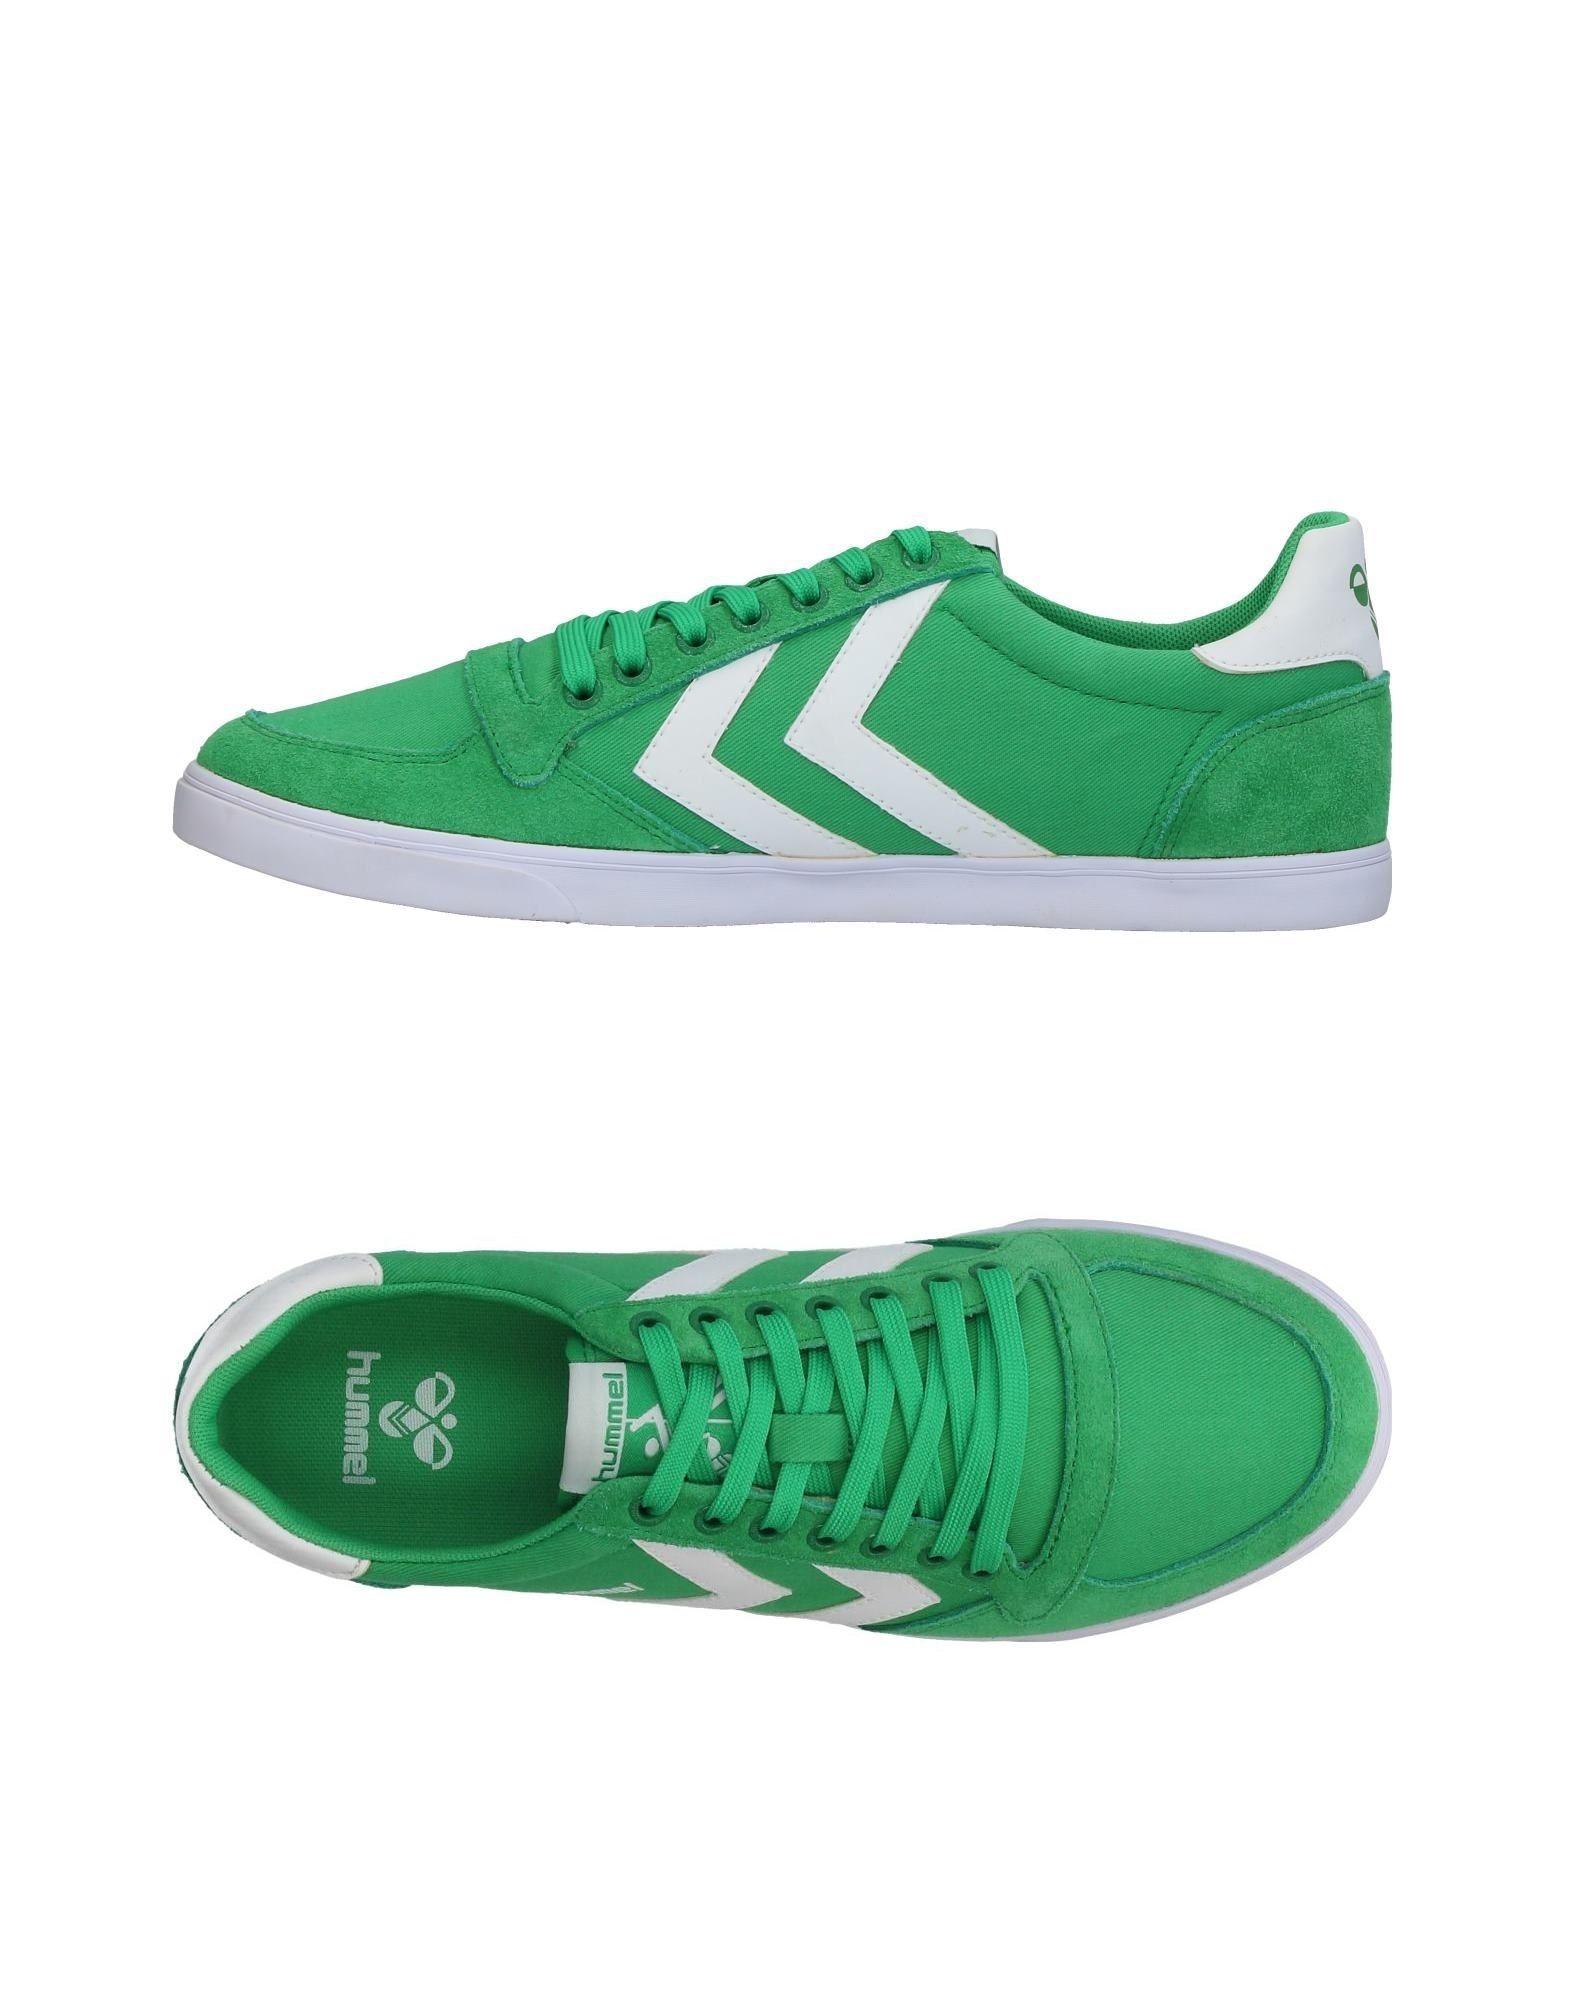 Moda Sneakers Hummel Uomo - 11415108GR